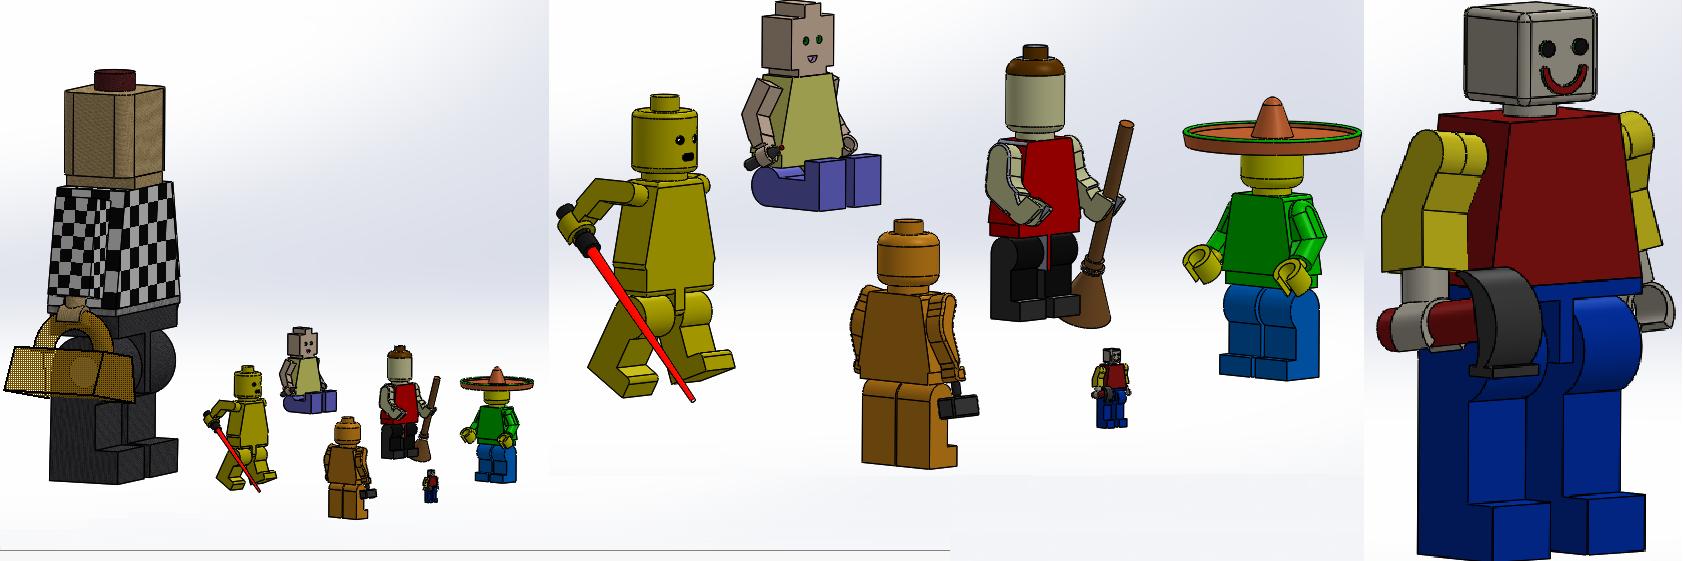 Https://www.instructables.com/Giant-wooden-Lego-men/